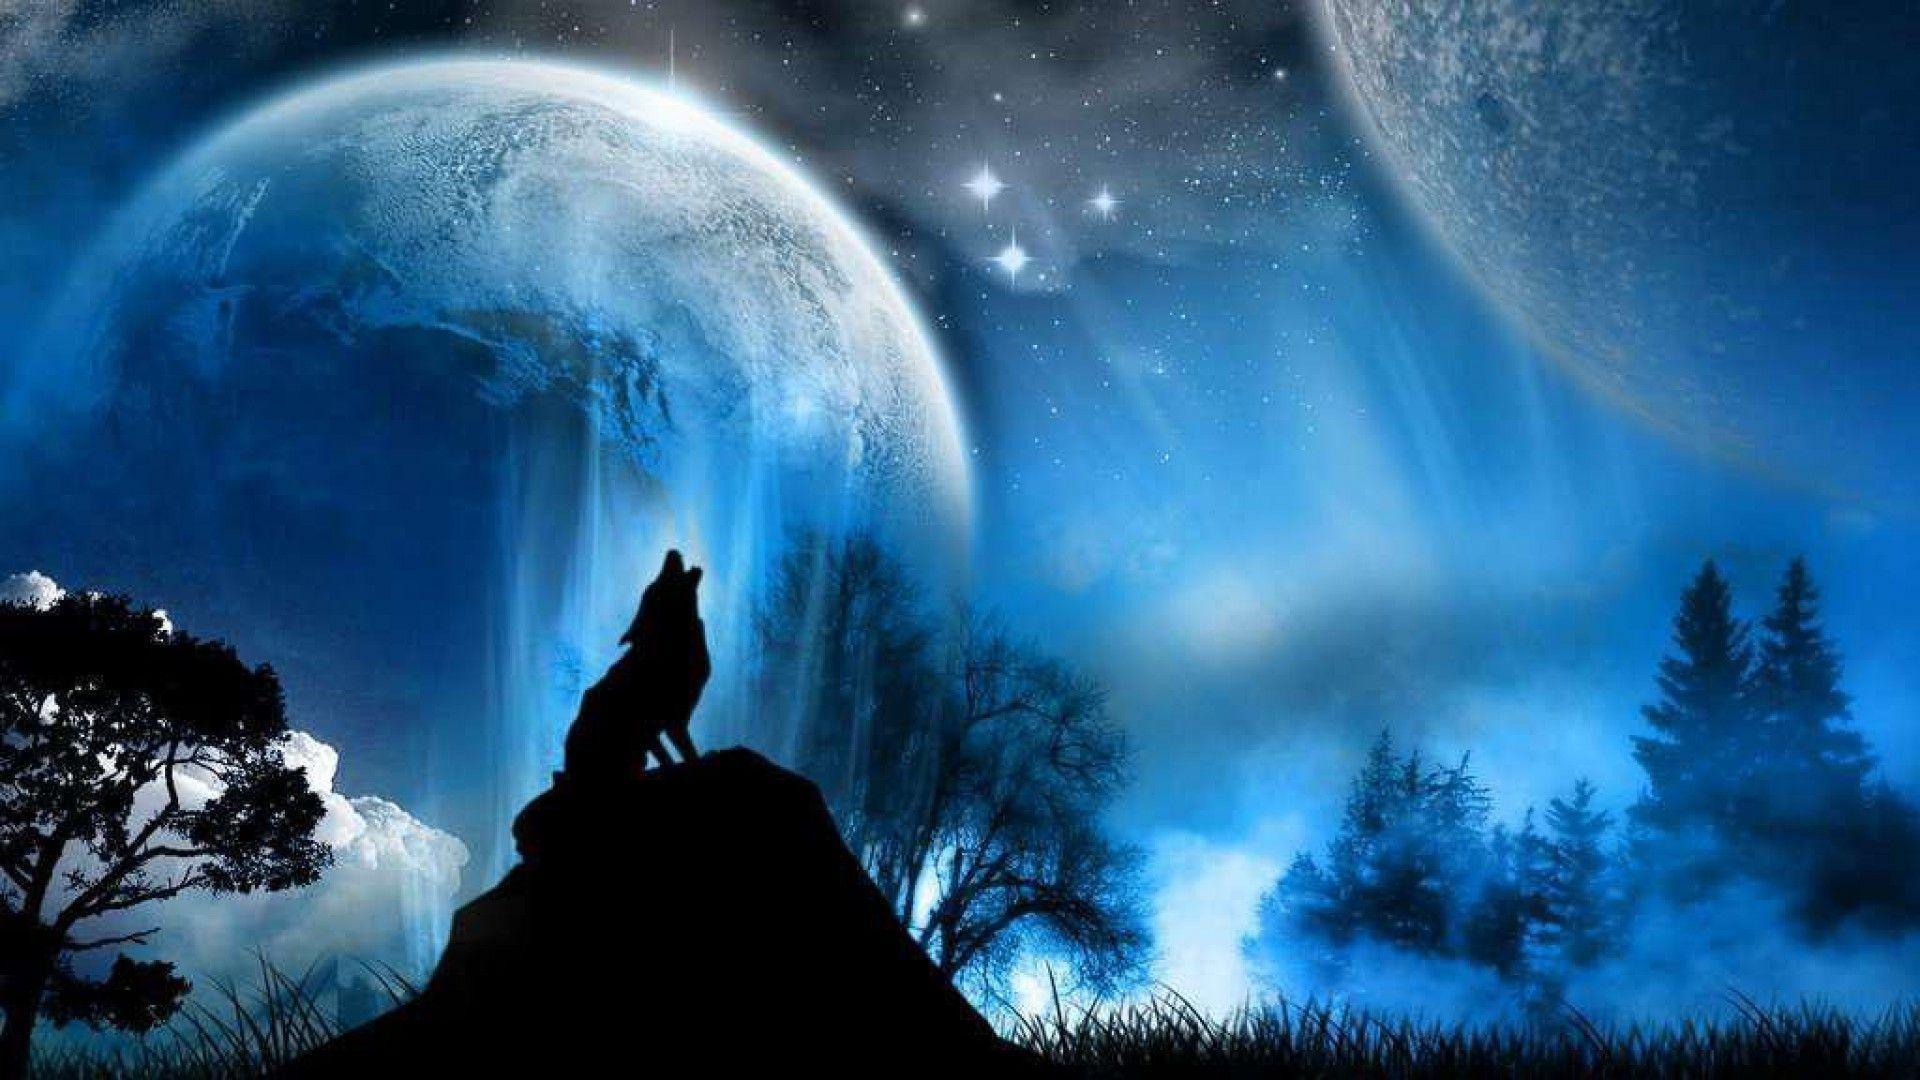 Werewolf wallpaper | Wallpaper Wide HD